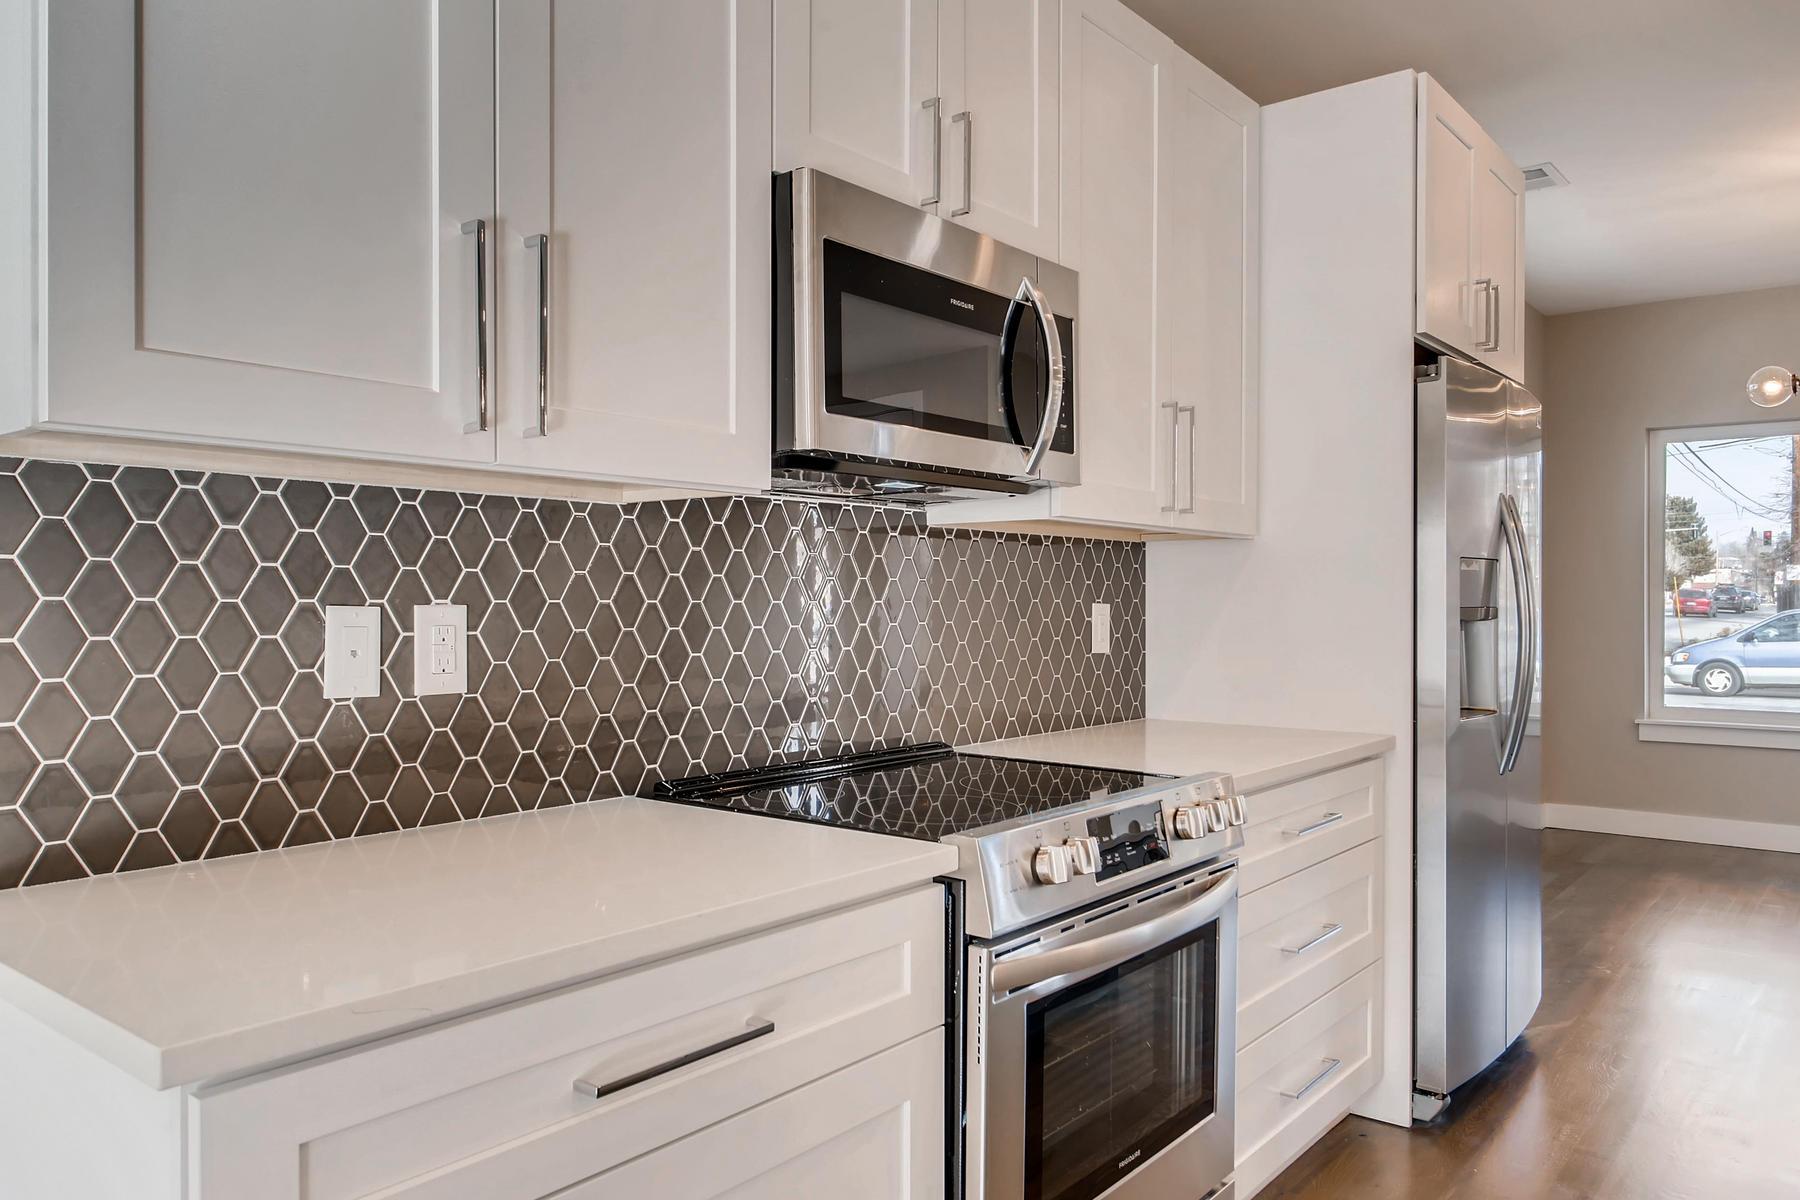 3101 S Cherokee St Englewood-007-5-Kitchen-MLS_Size.jpg